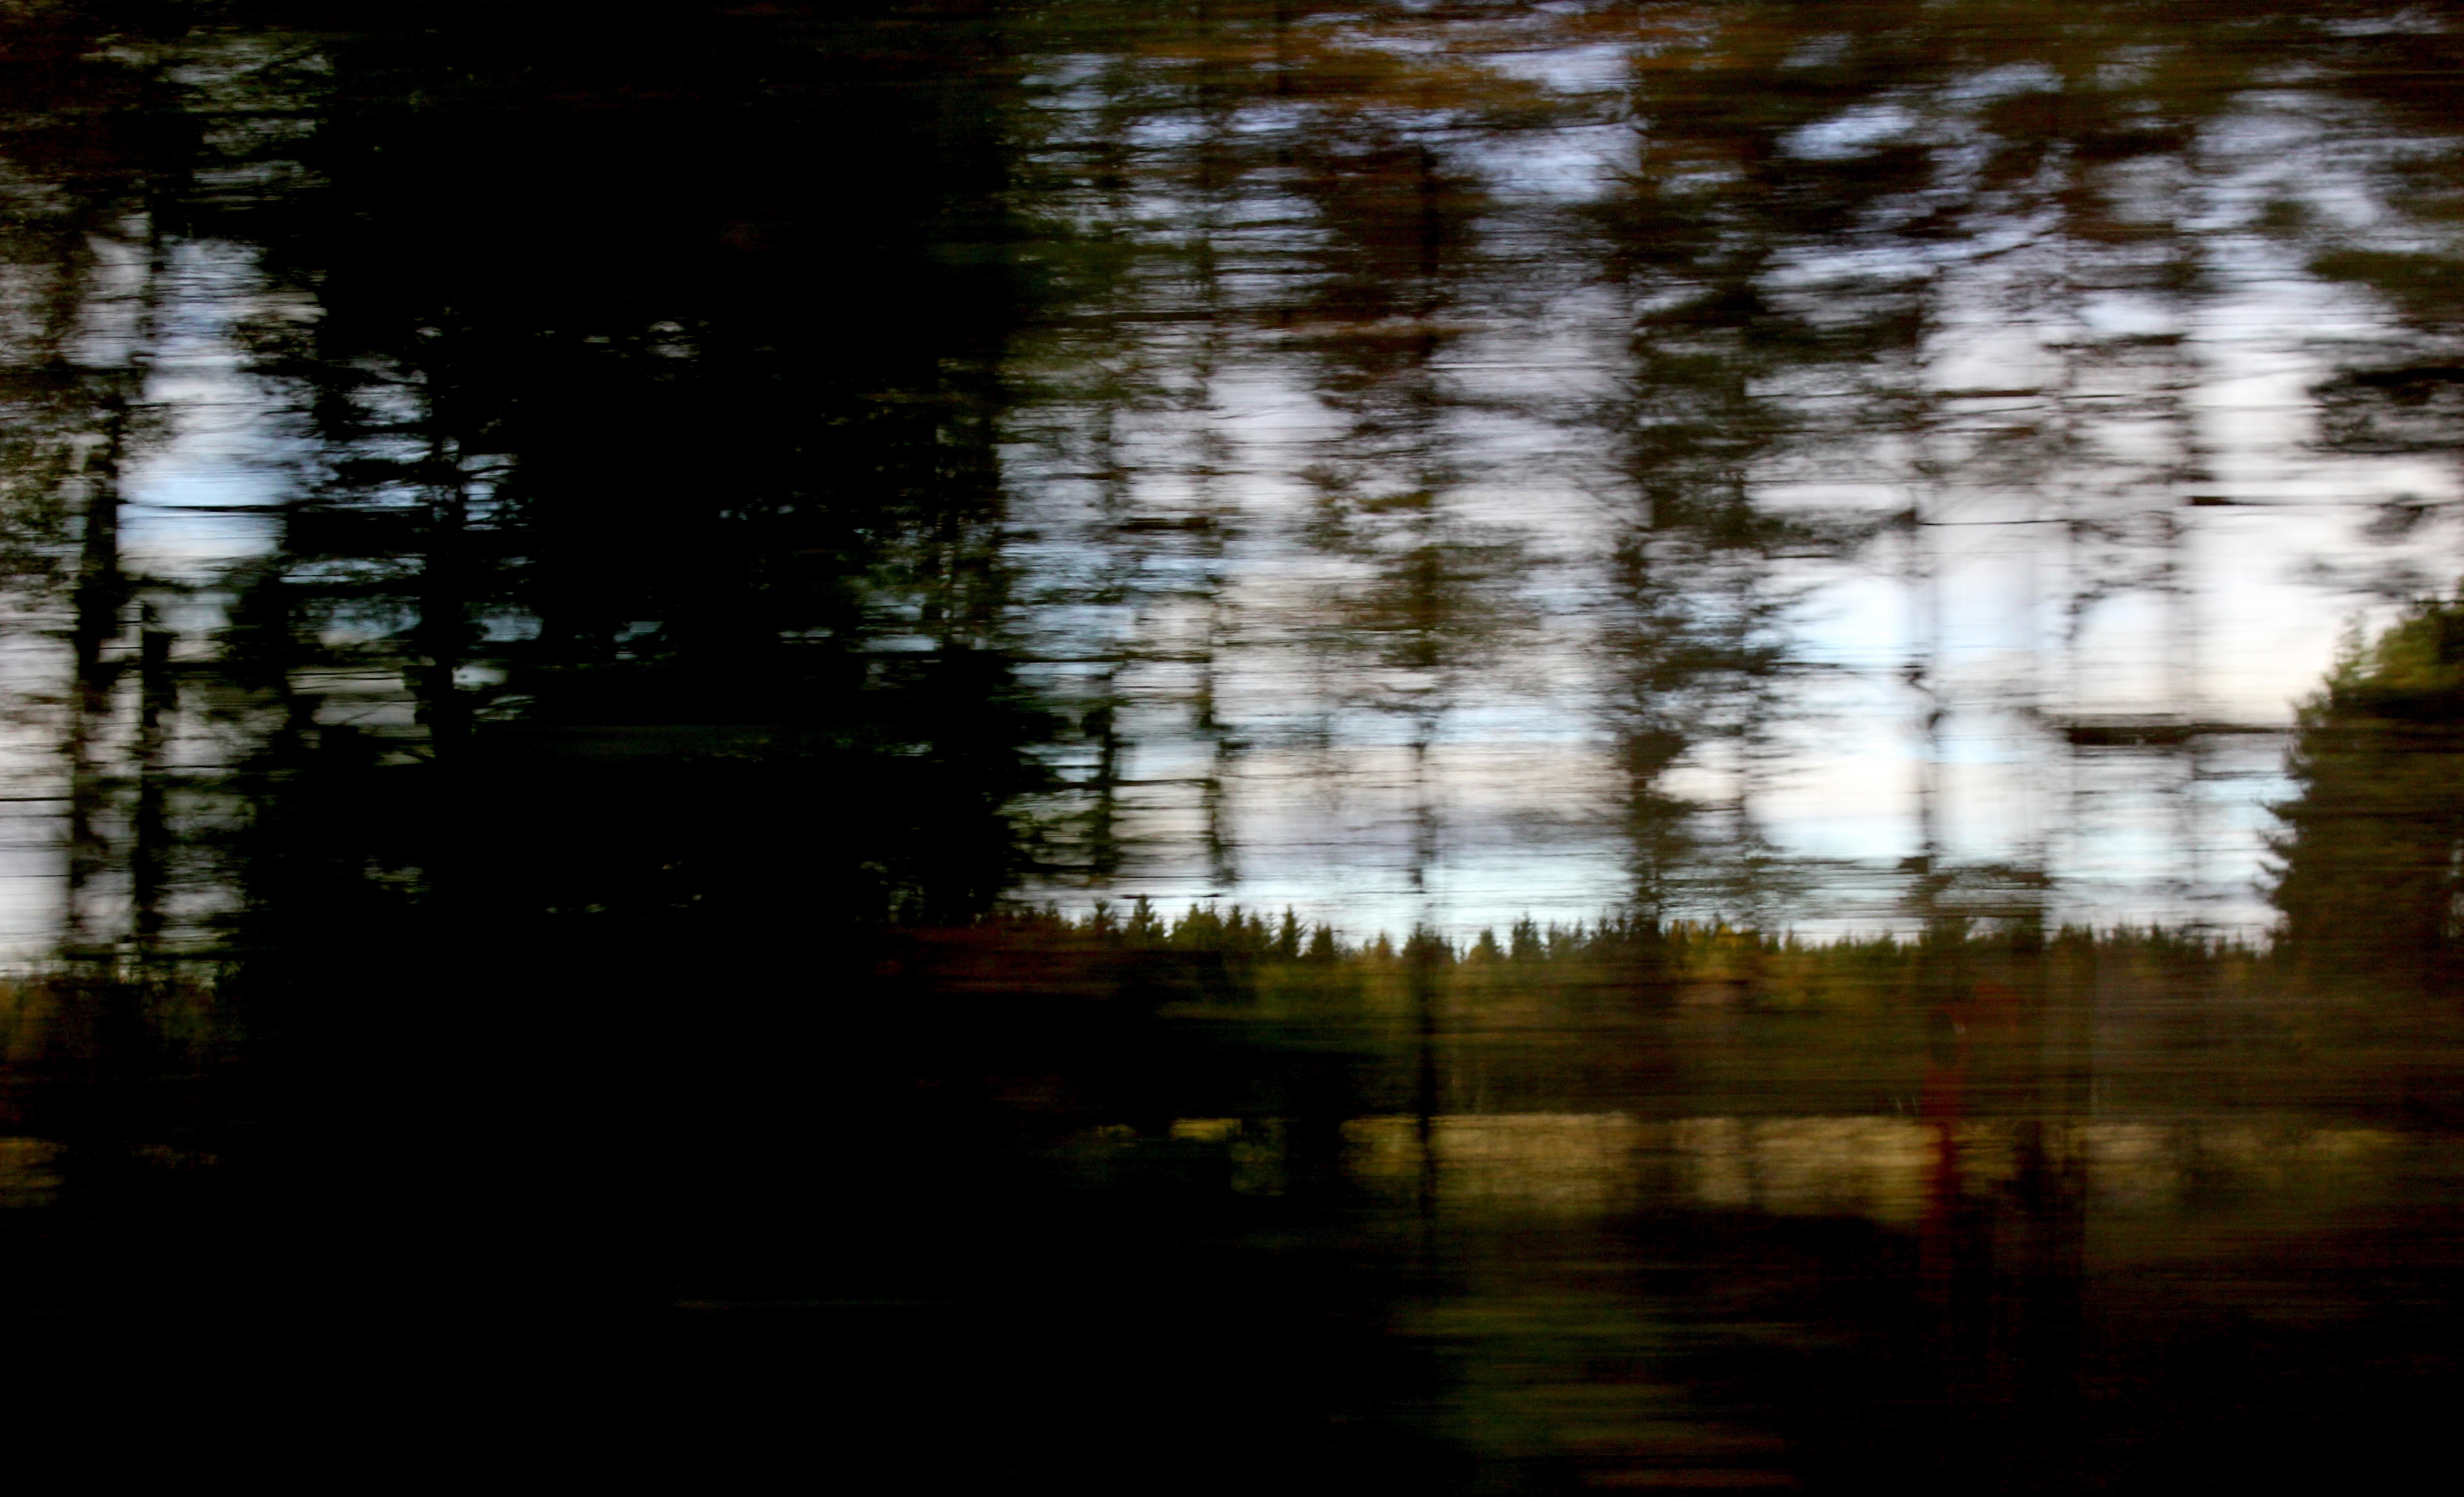 Skog-forest #4